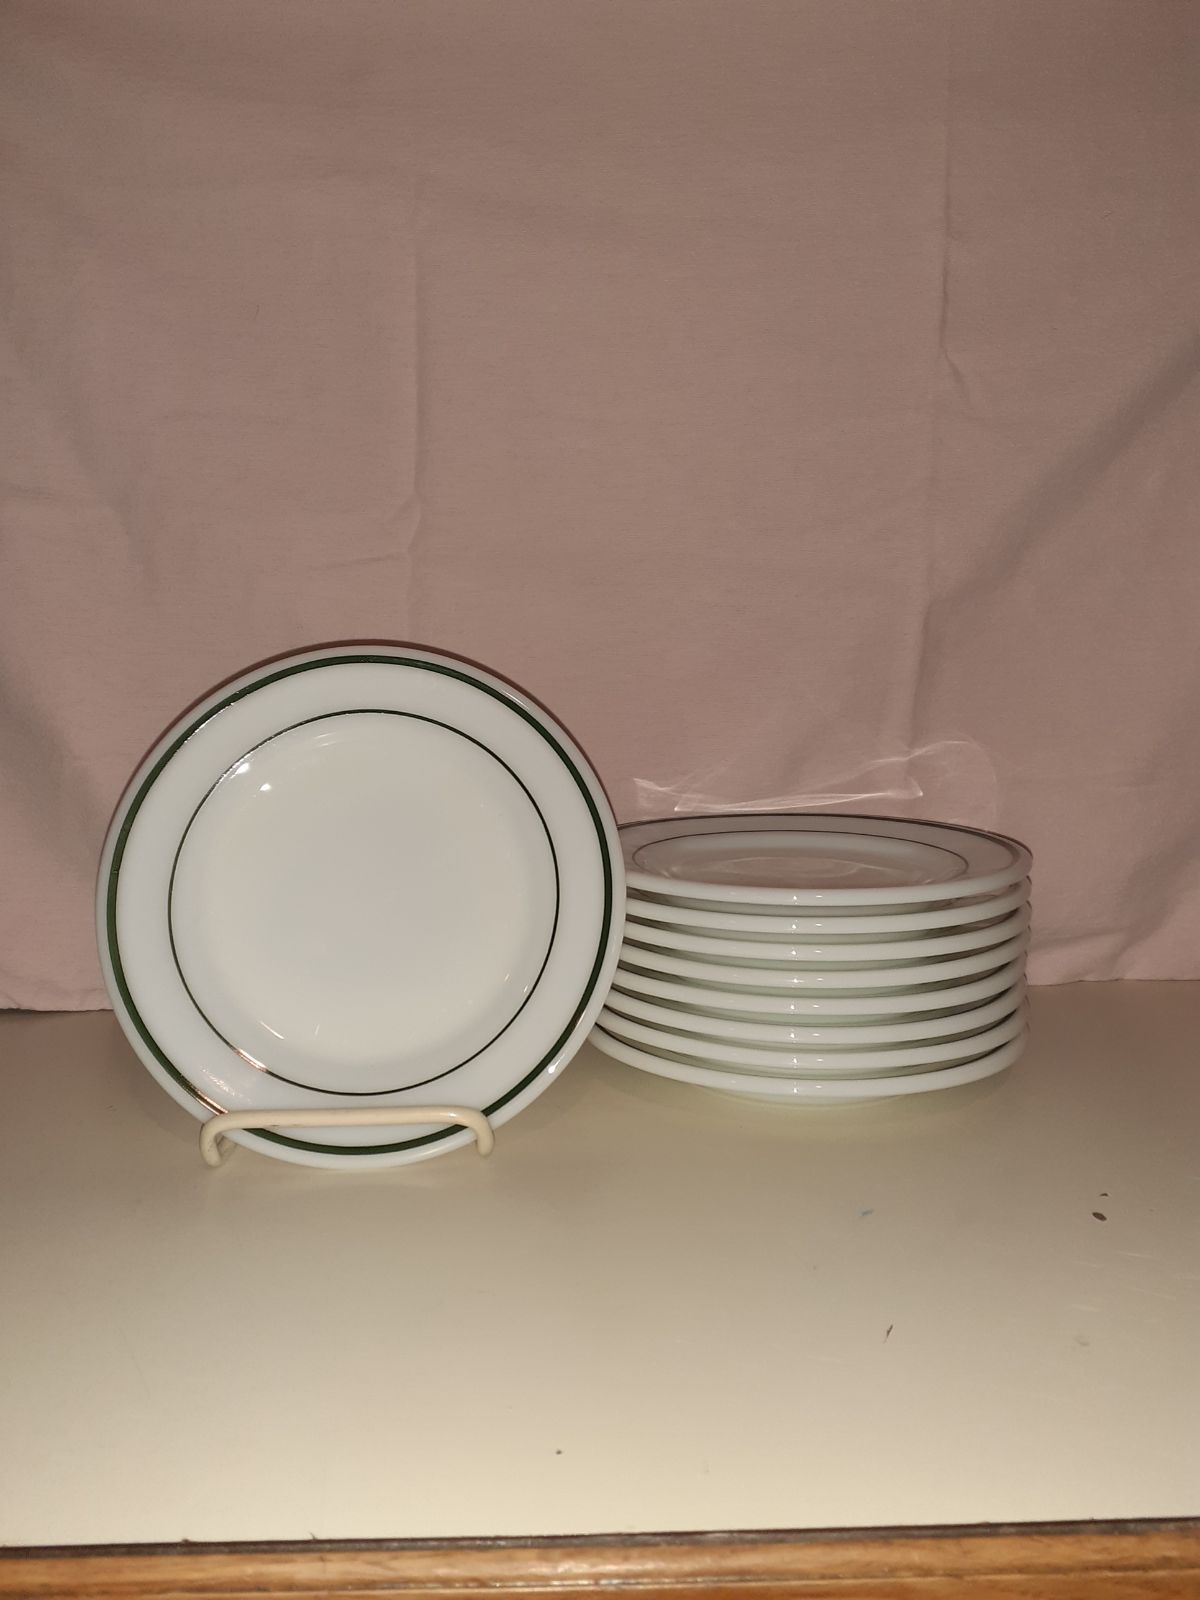 "9 Corning Decor 6¾"" Plates GREEN BAND Op"